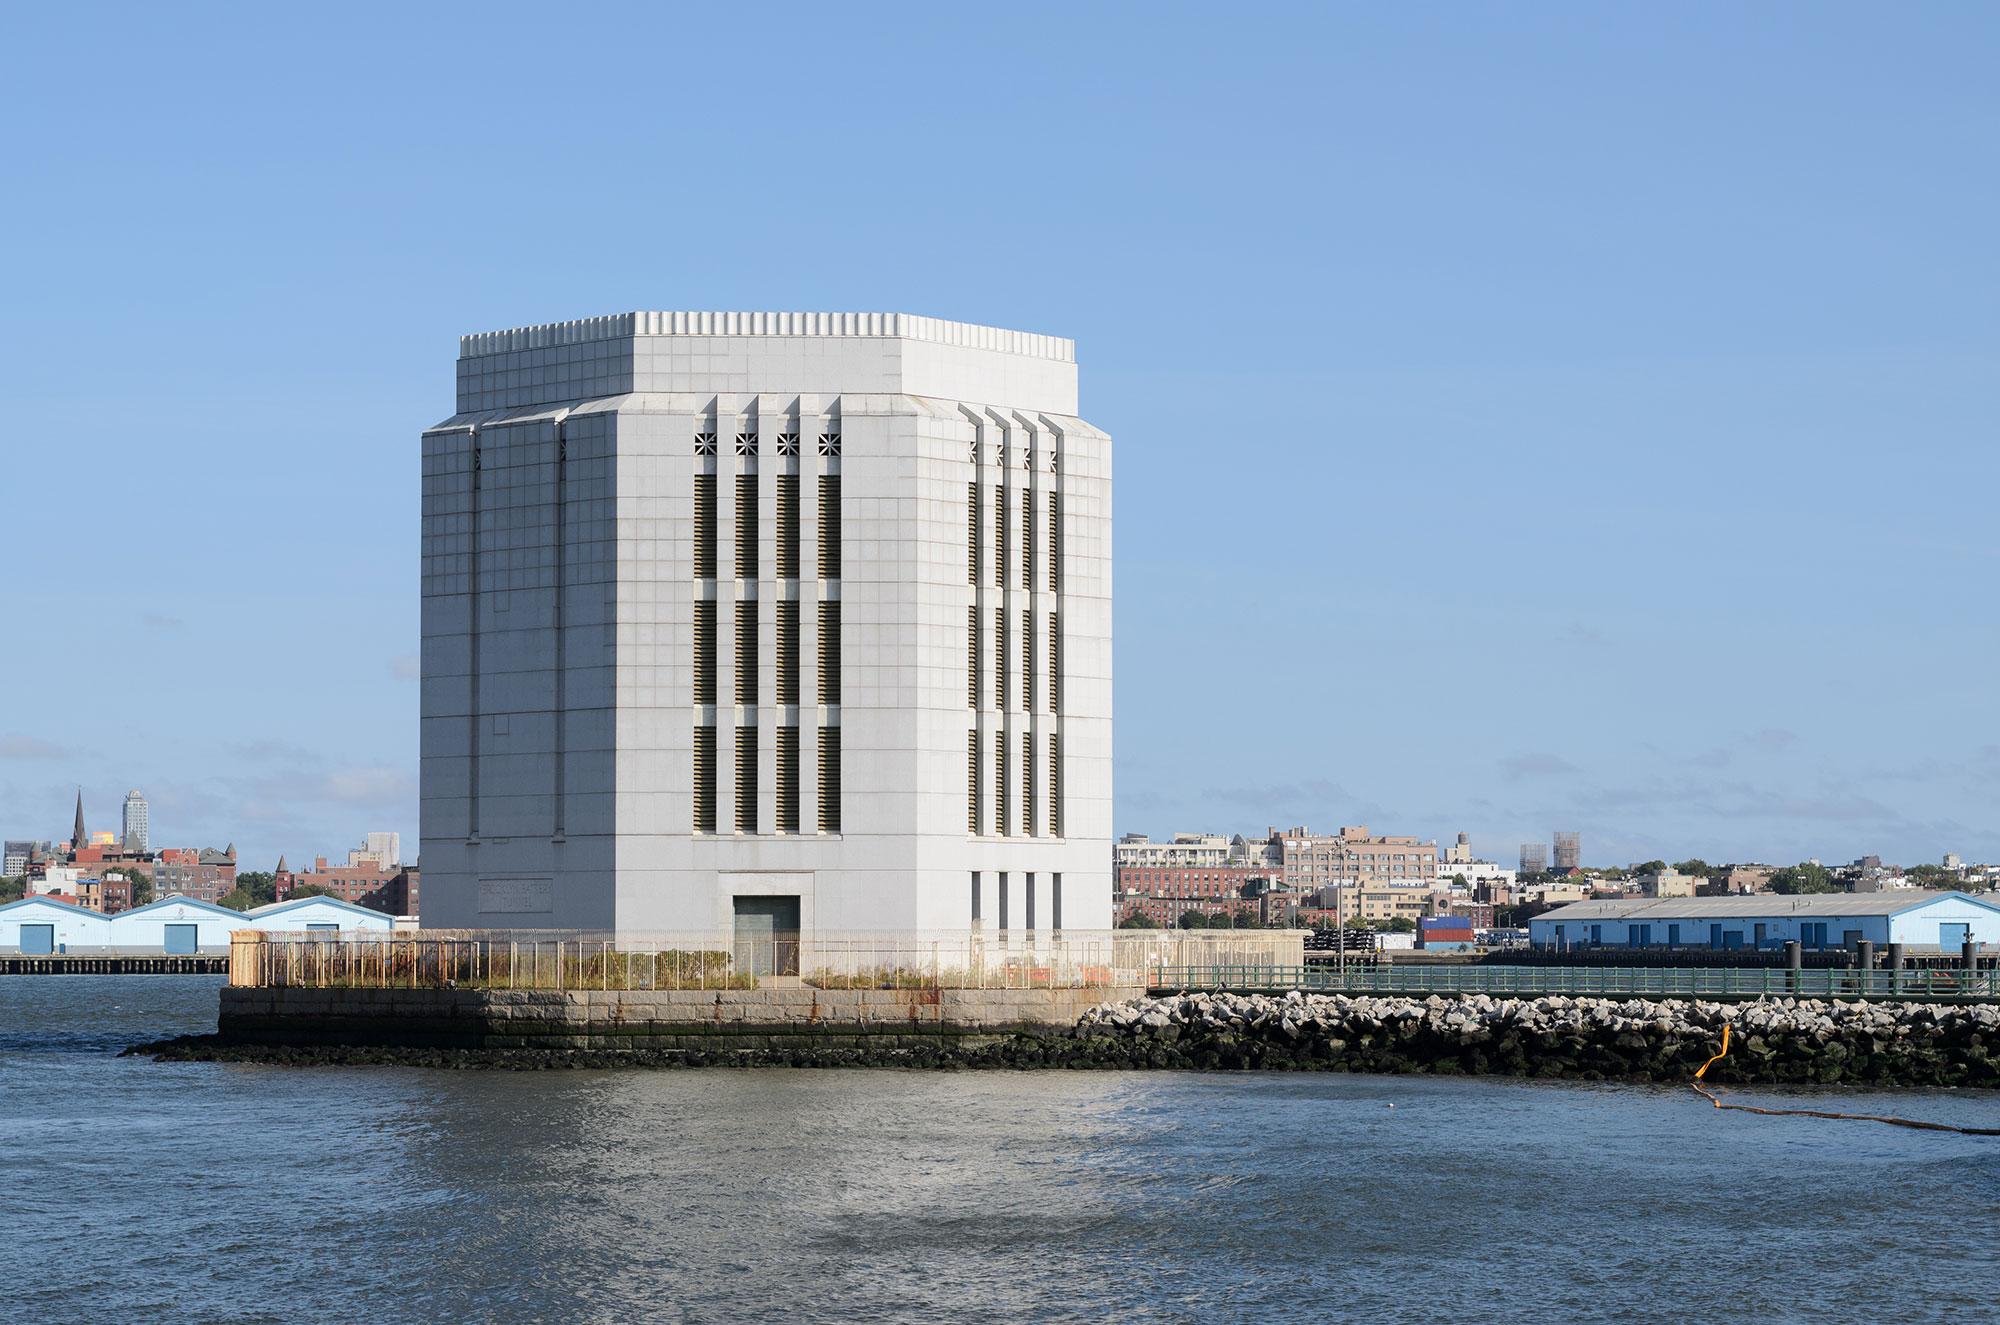 Вентиляционная башня тоннеля Бруклин-Бэттери